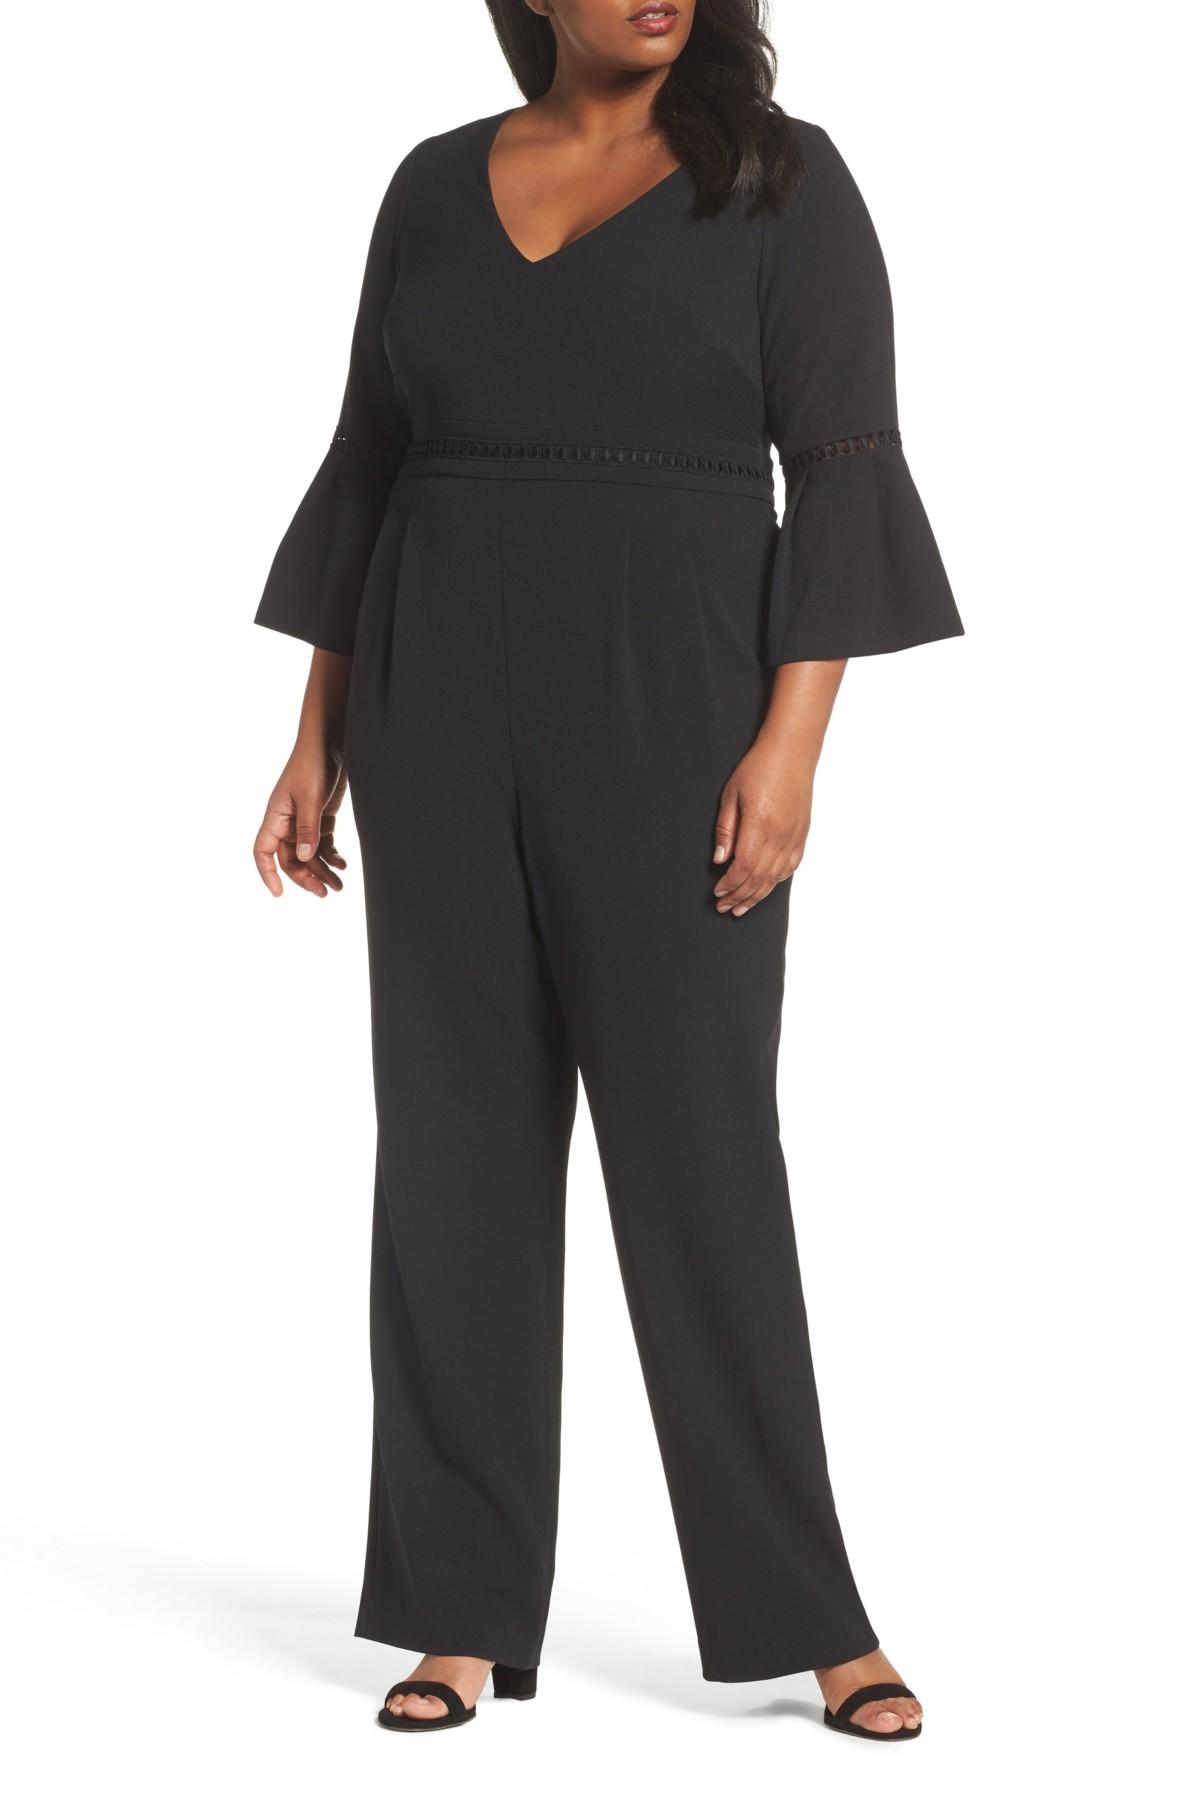 Eliza  women   regular size guideinches also bell sleeve jumpsuit sz  black ebay rh